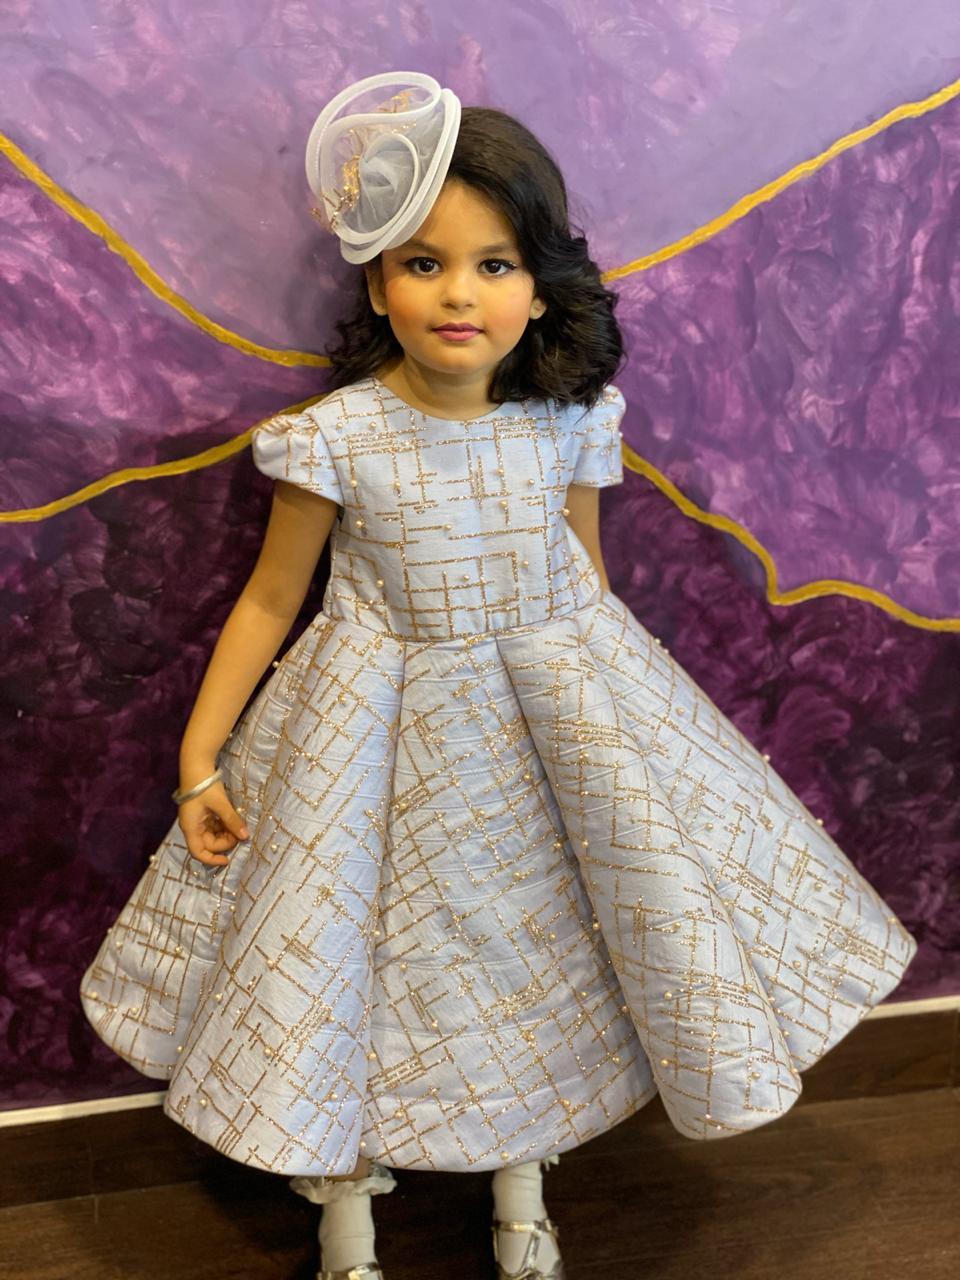 birthday dress for girl baby (3)